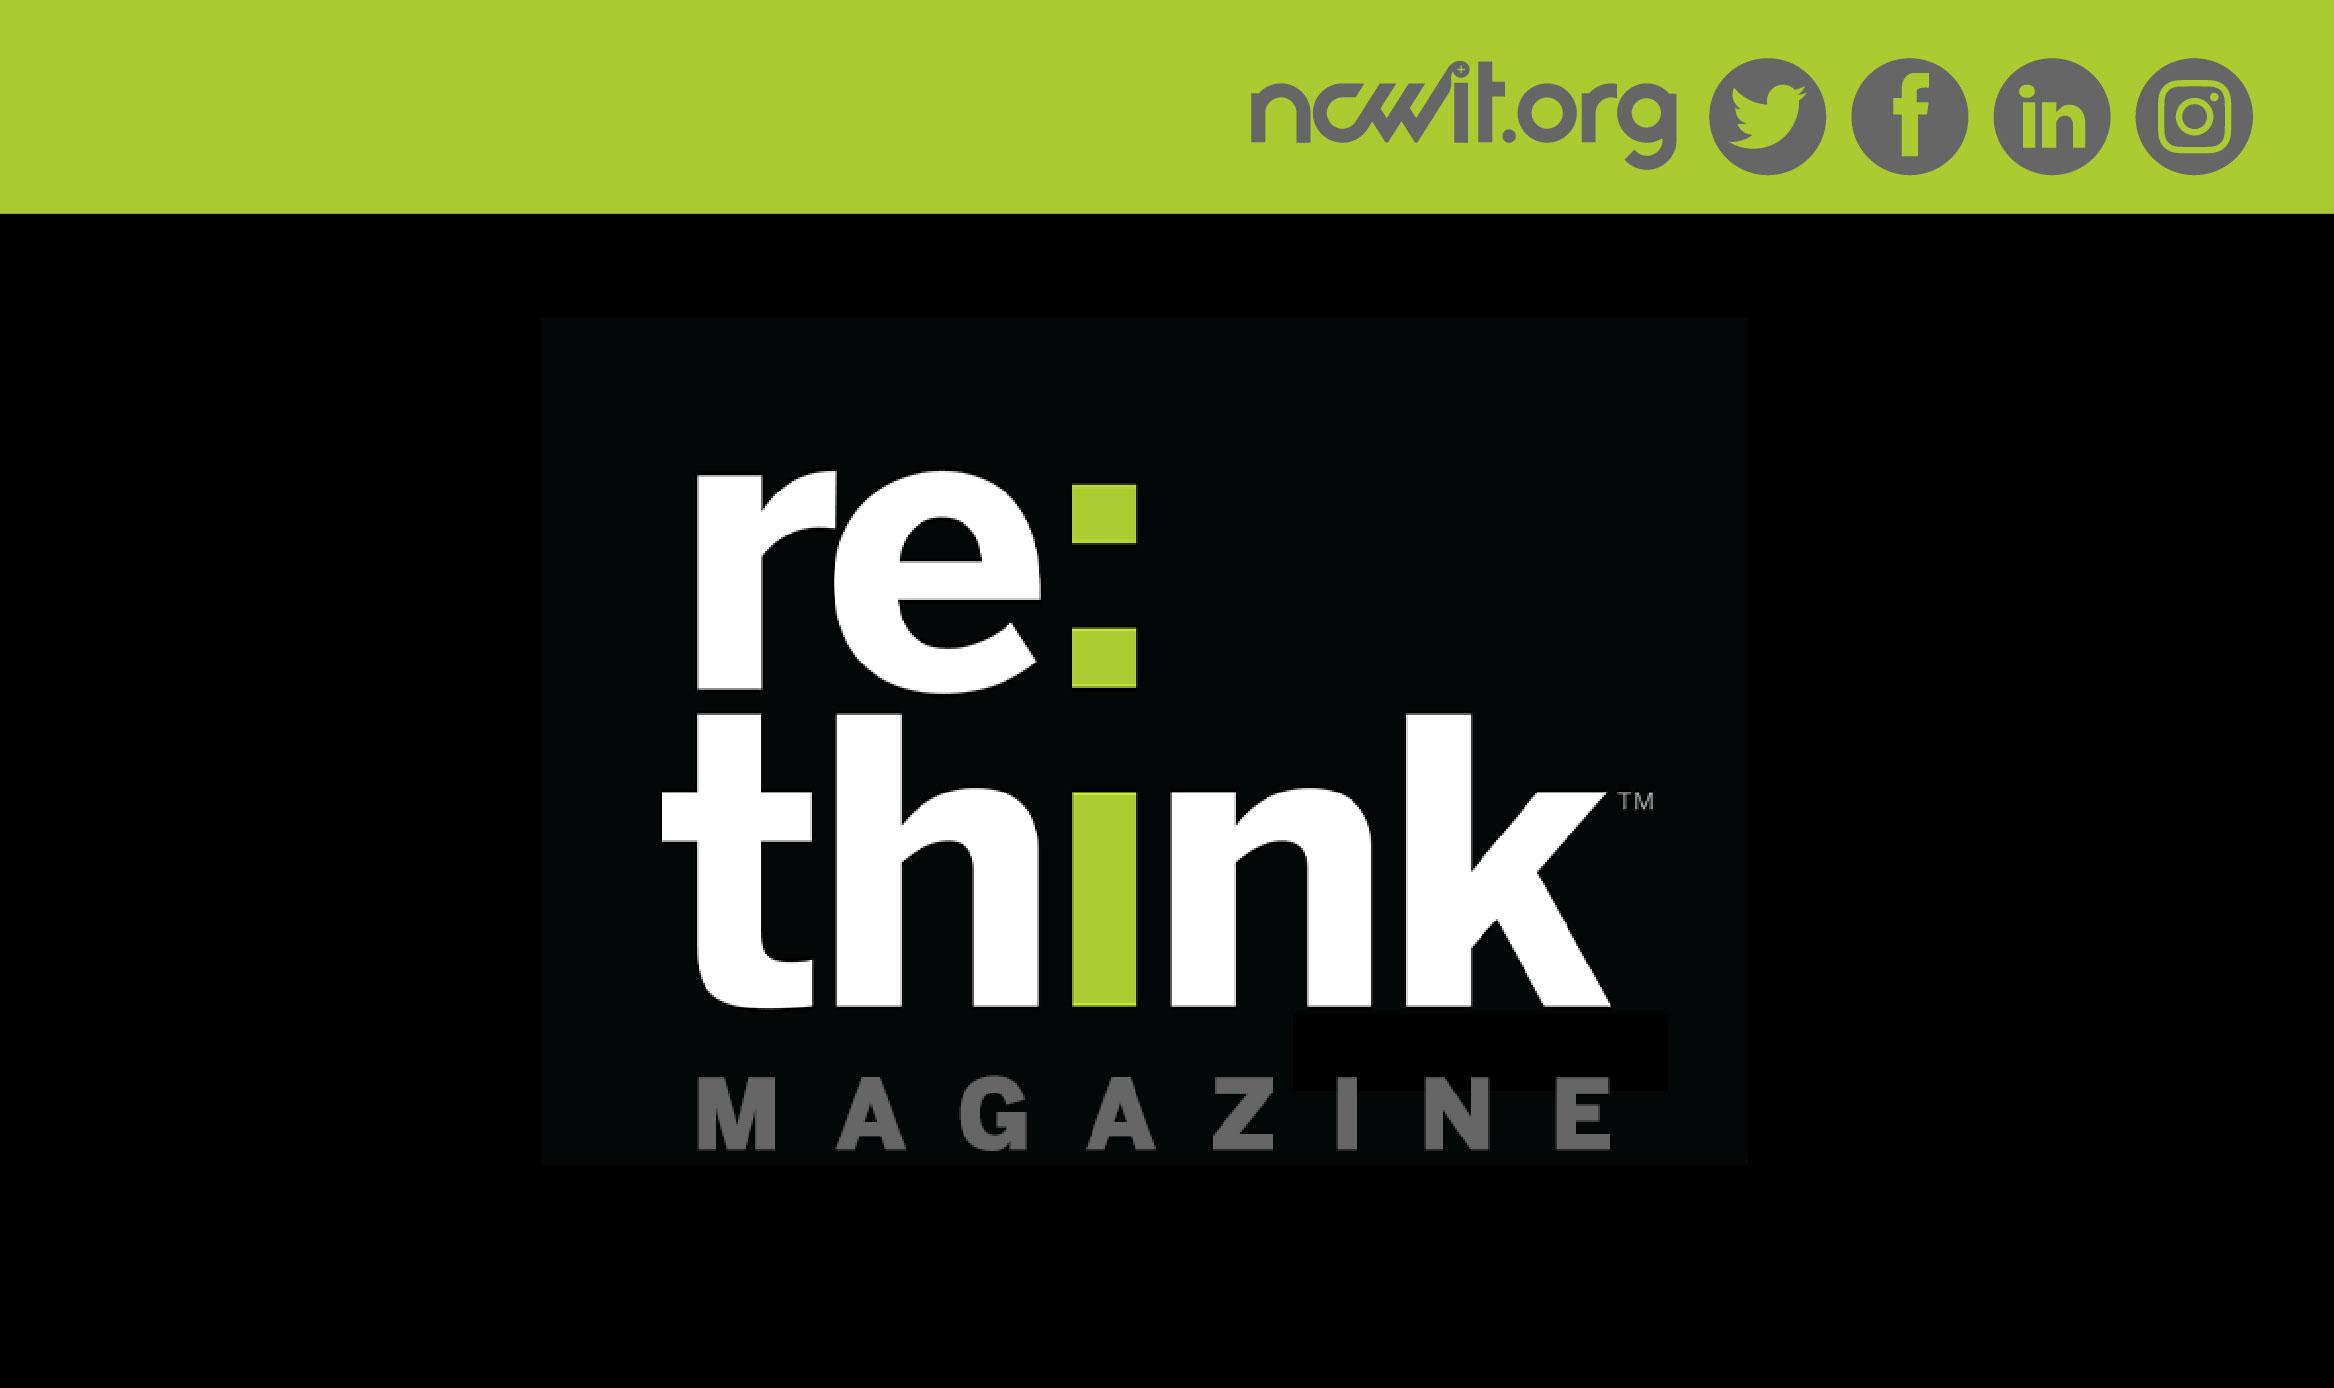 re:think magazine